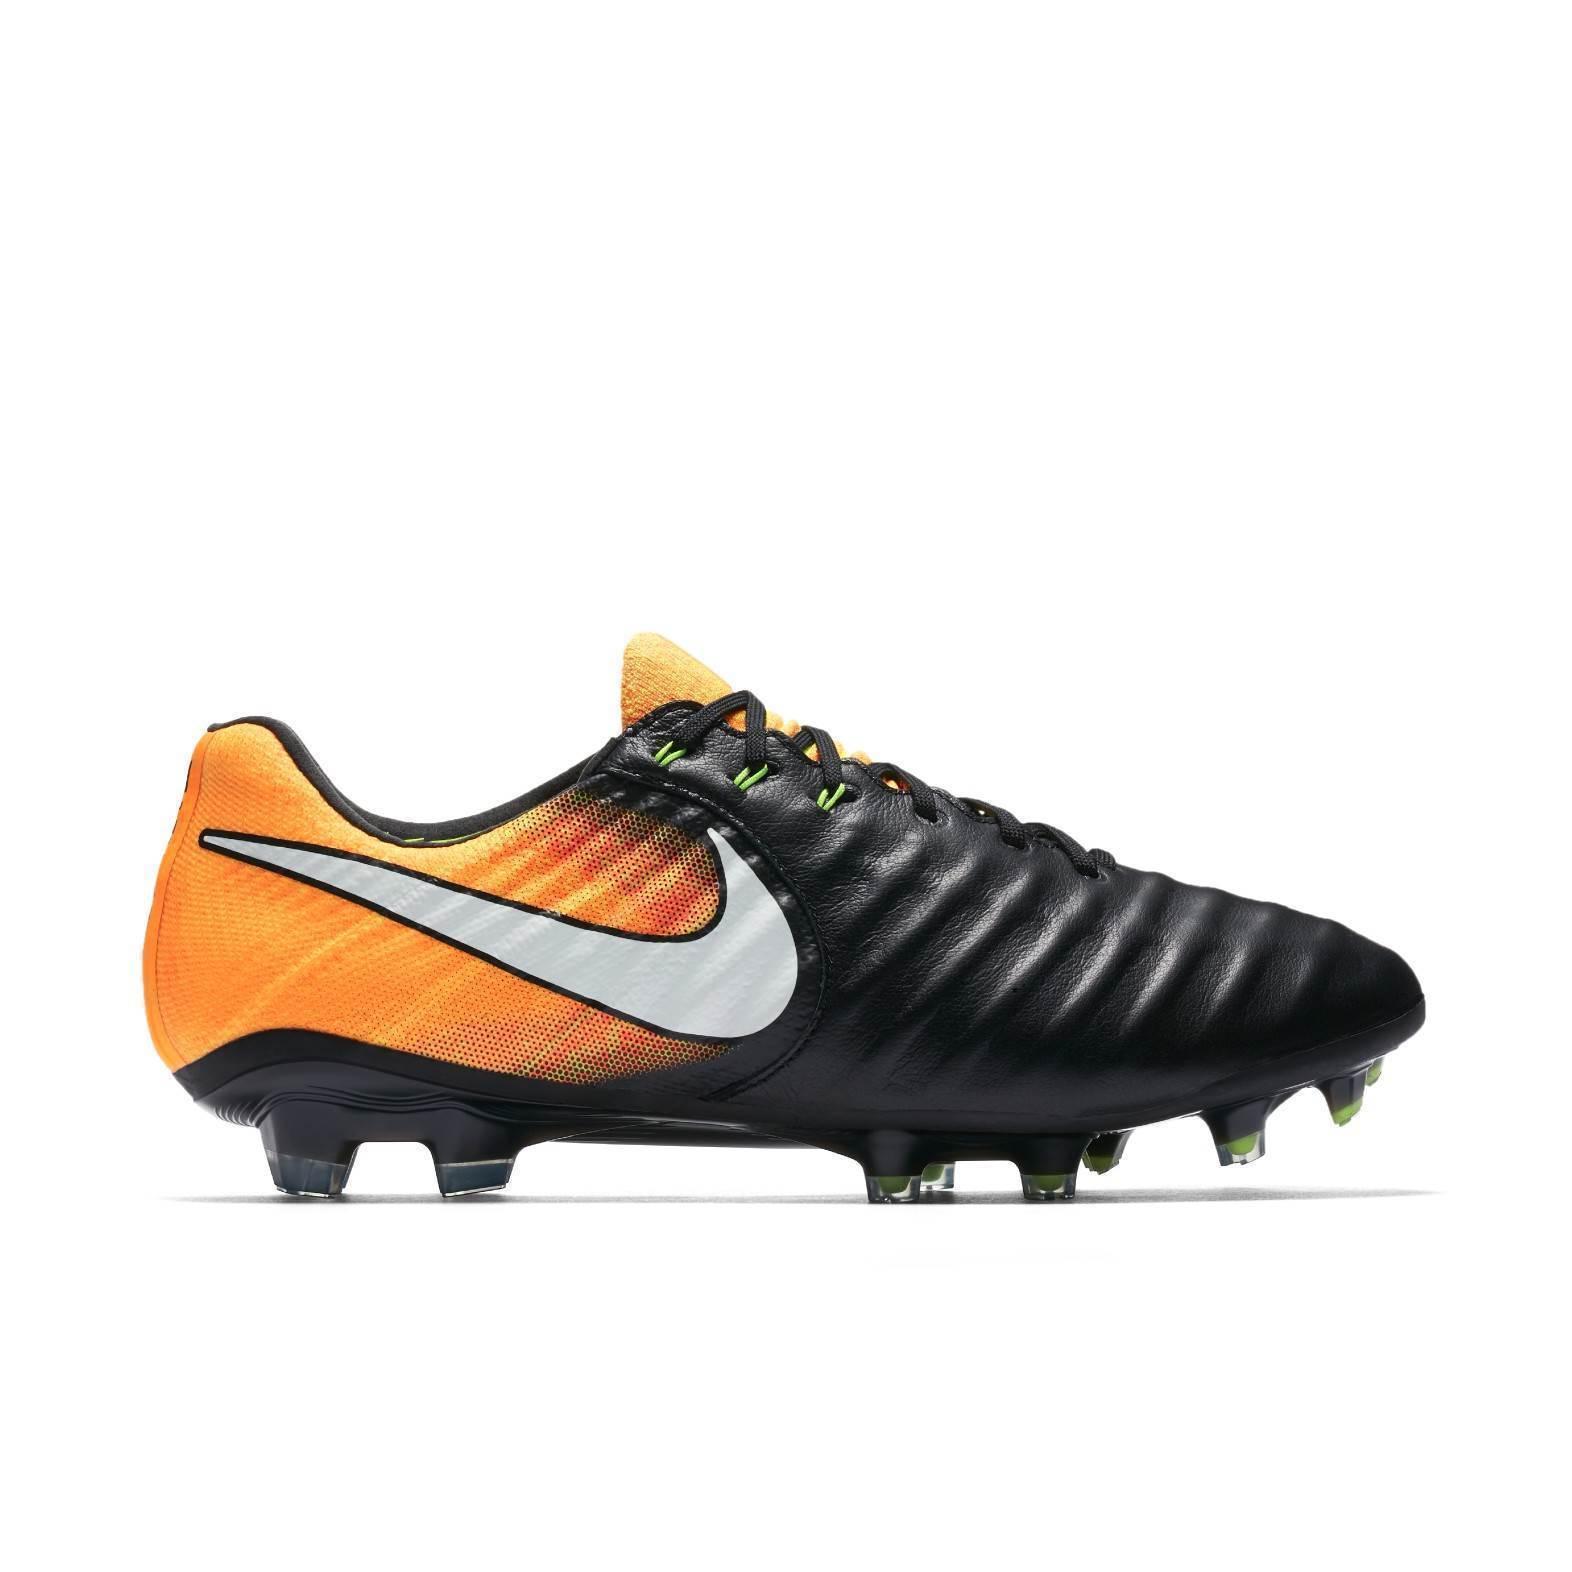 ef45d6ef7 Gallery  Nike s Tiempo Legend VII - Boots - FTBL Life